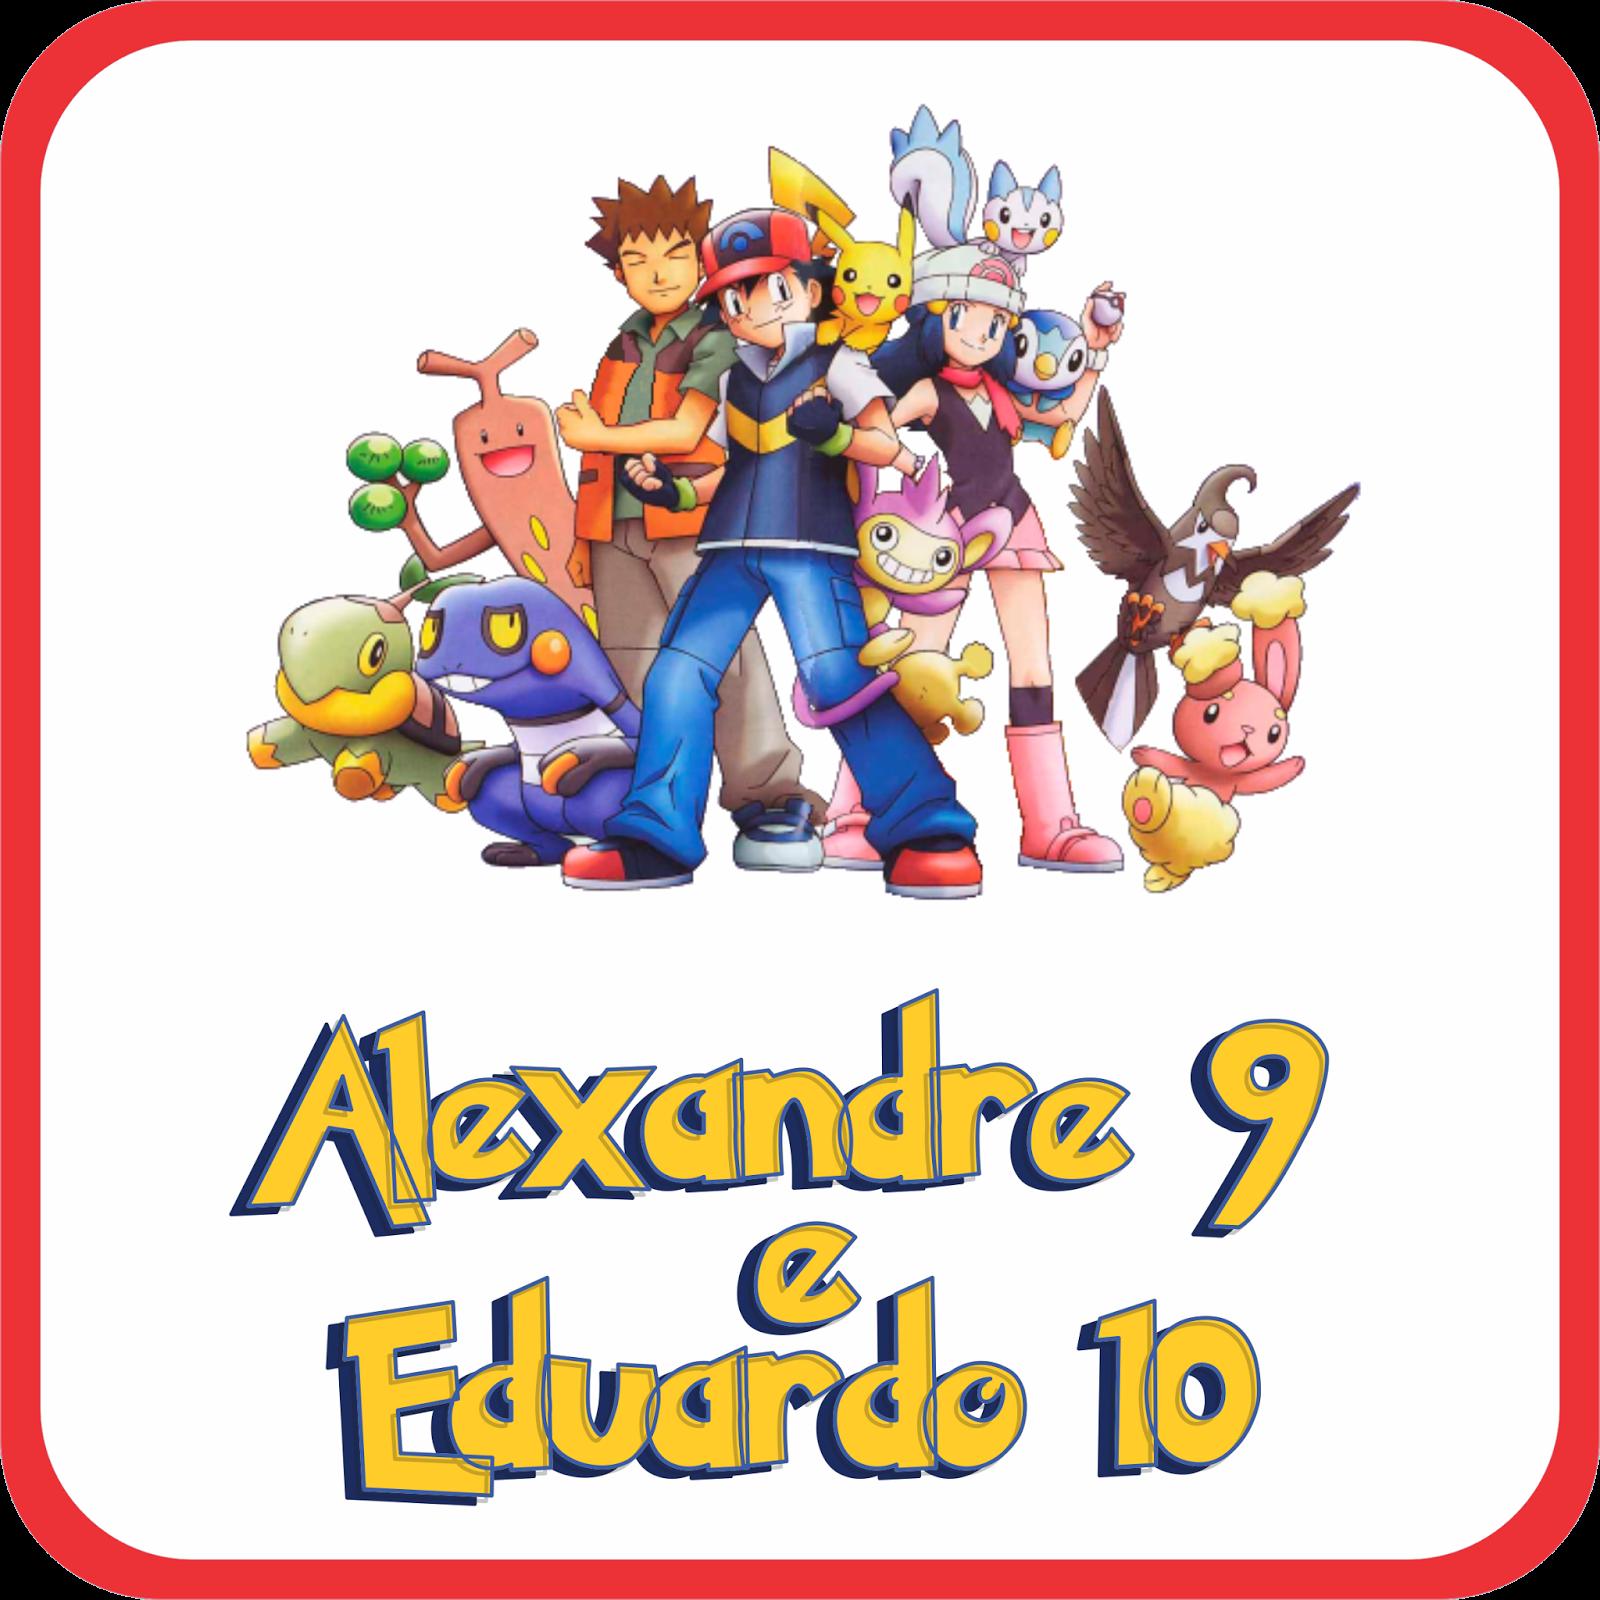 https://fruipartis.blogspot.com.br/2017/03/pokemon-ale-e-dudu.html